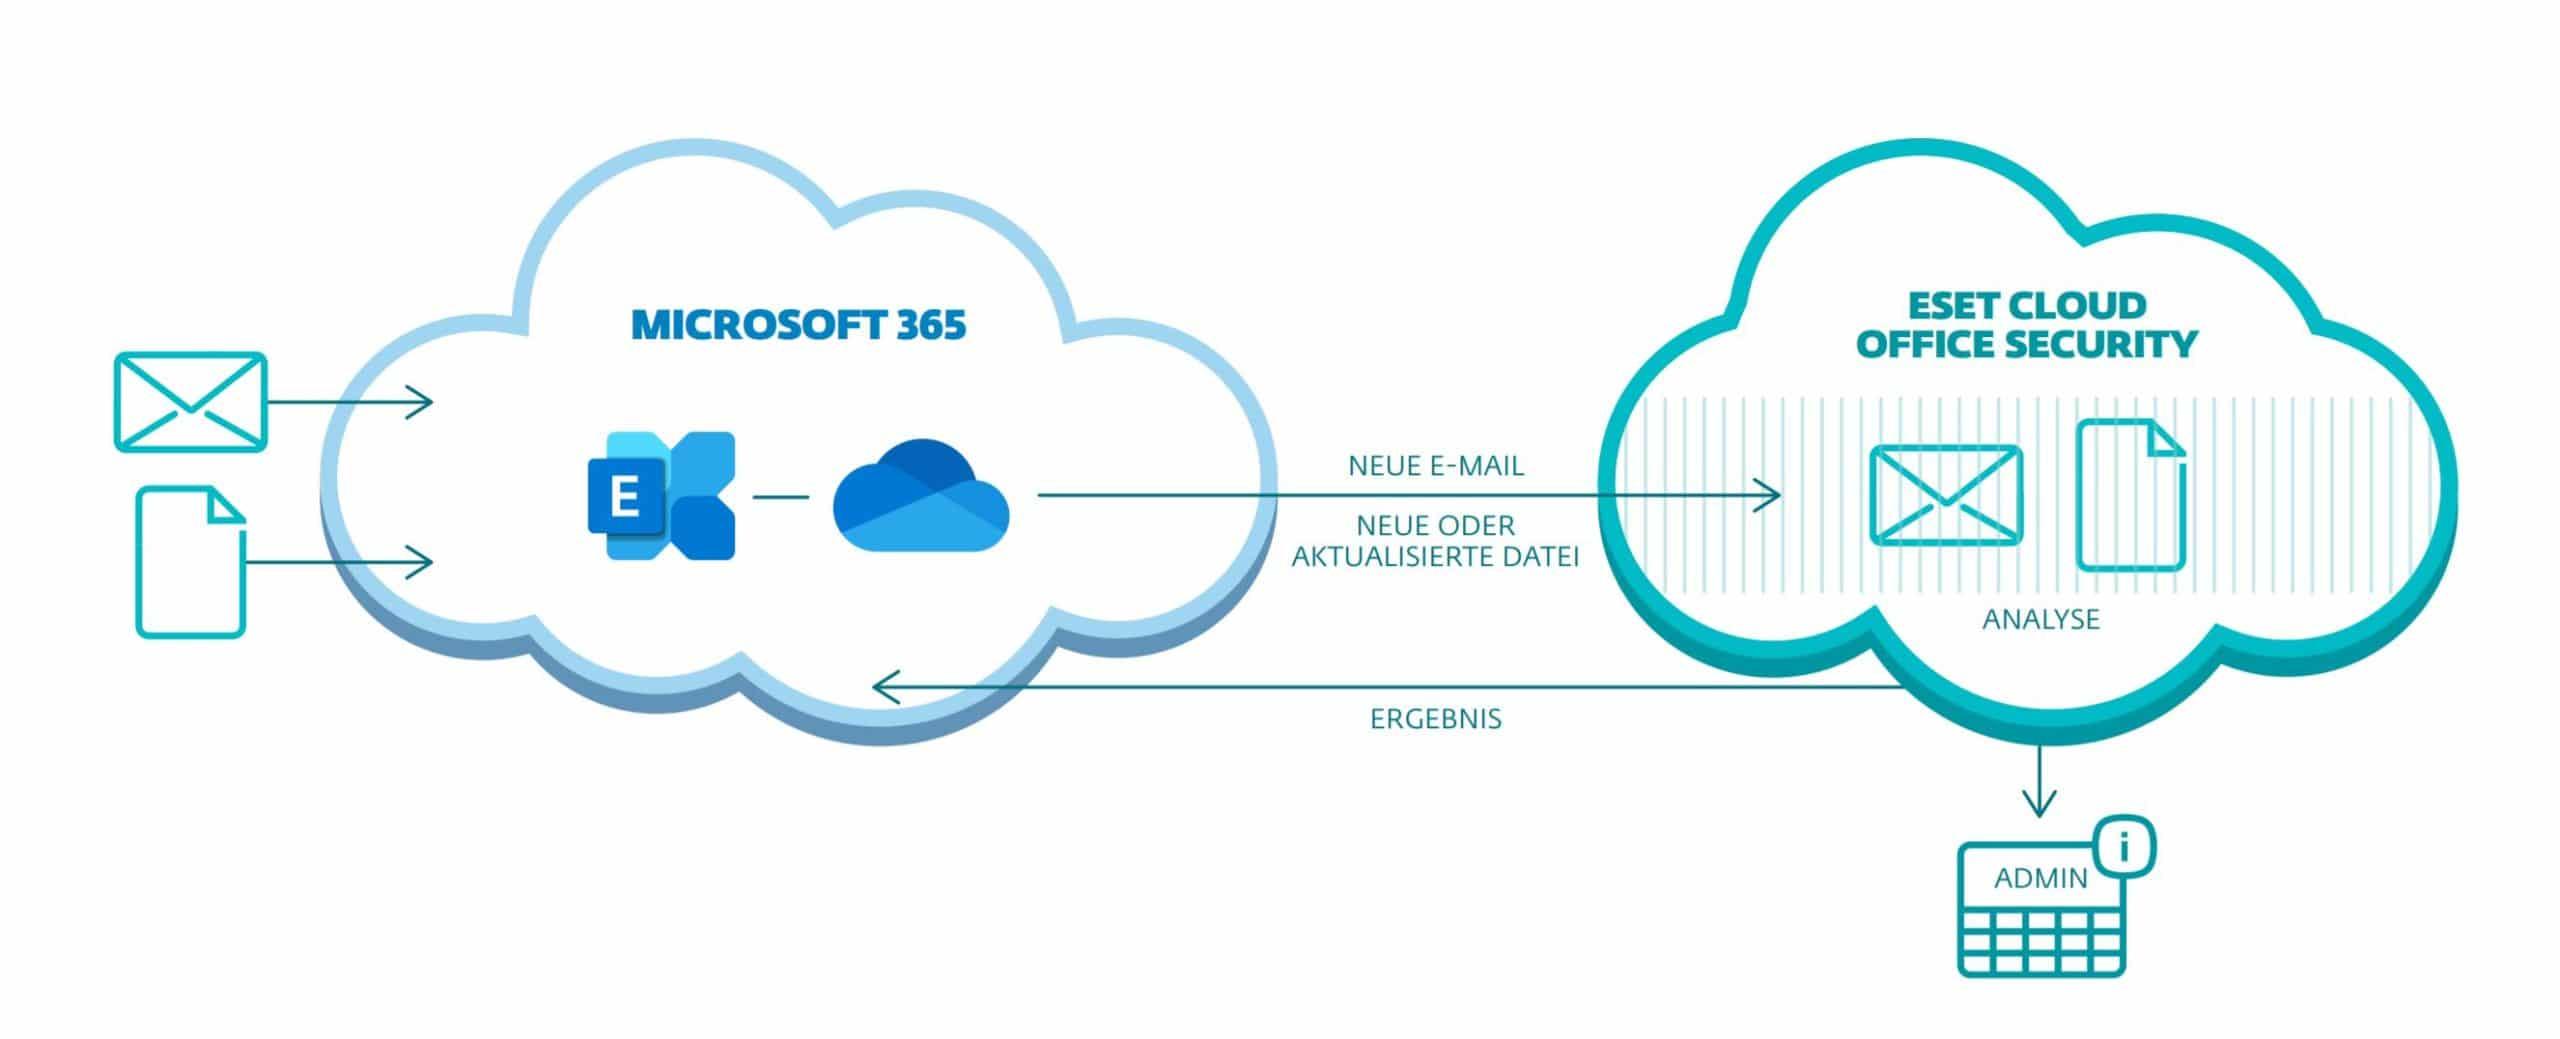 eset-office-cloud-schaubild-365